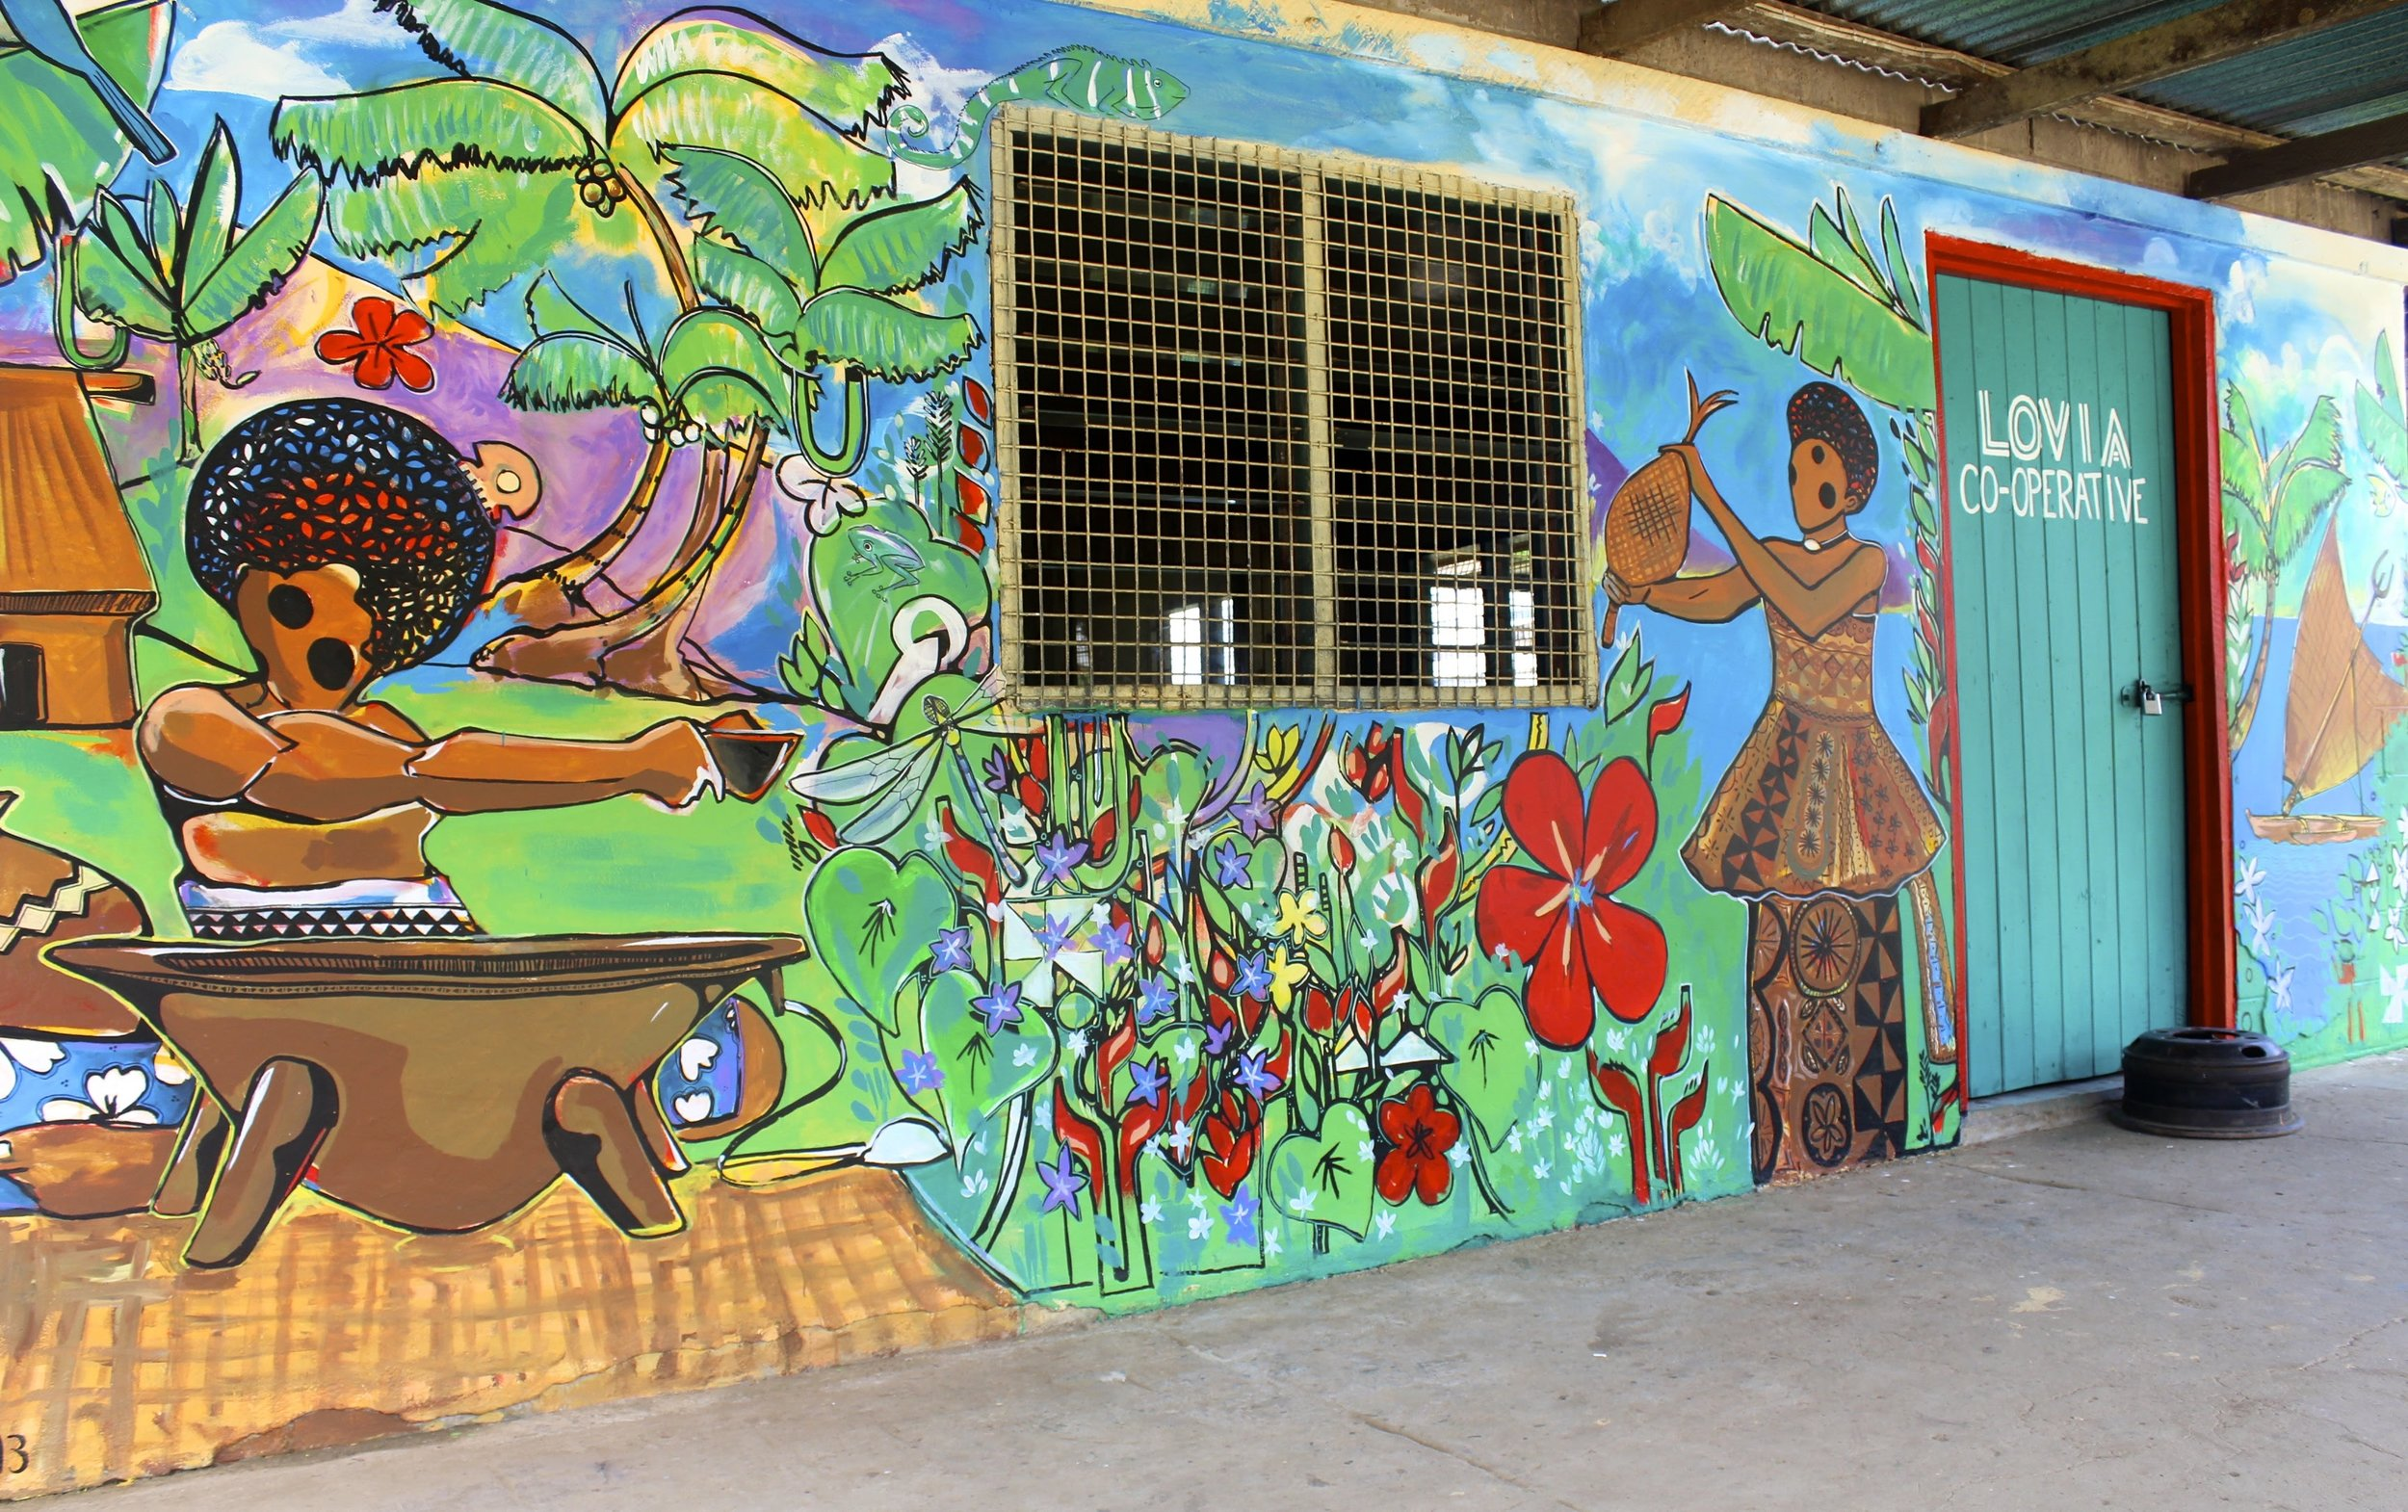 Lovia Co-op Mural